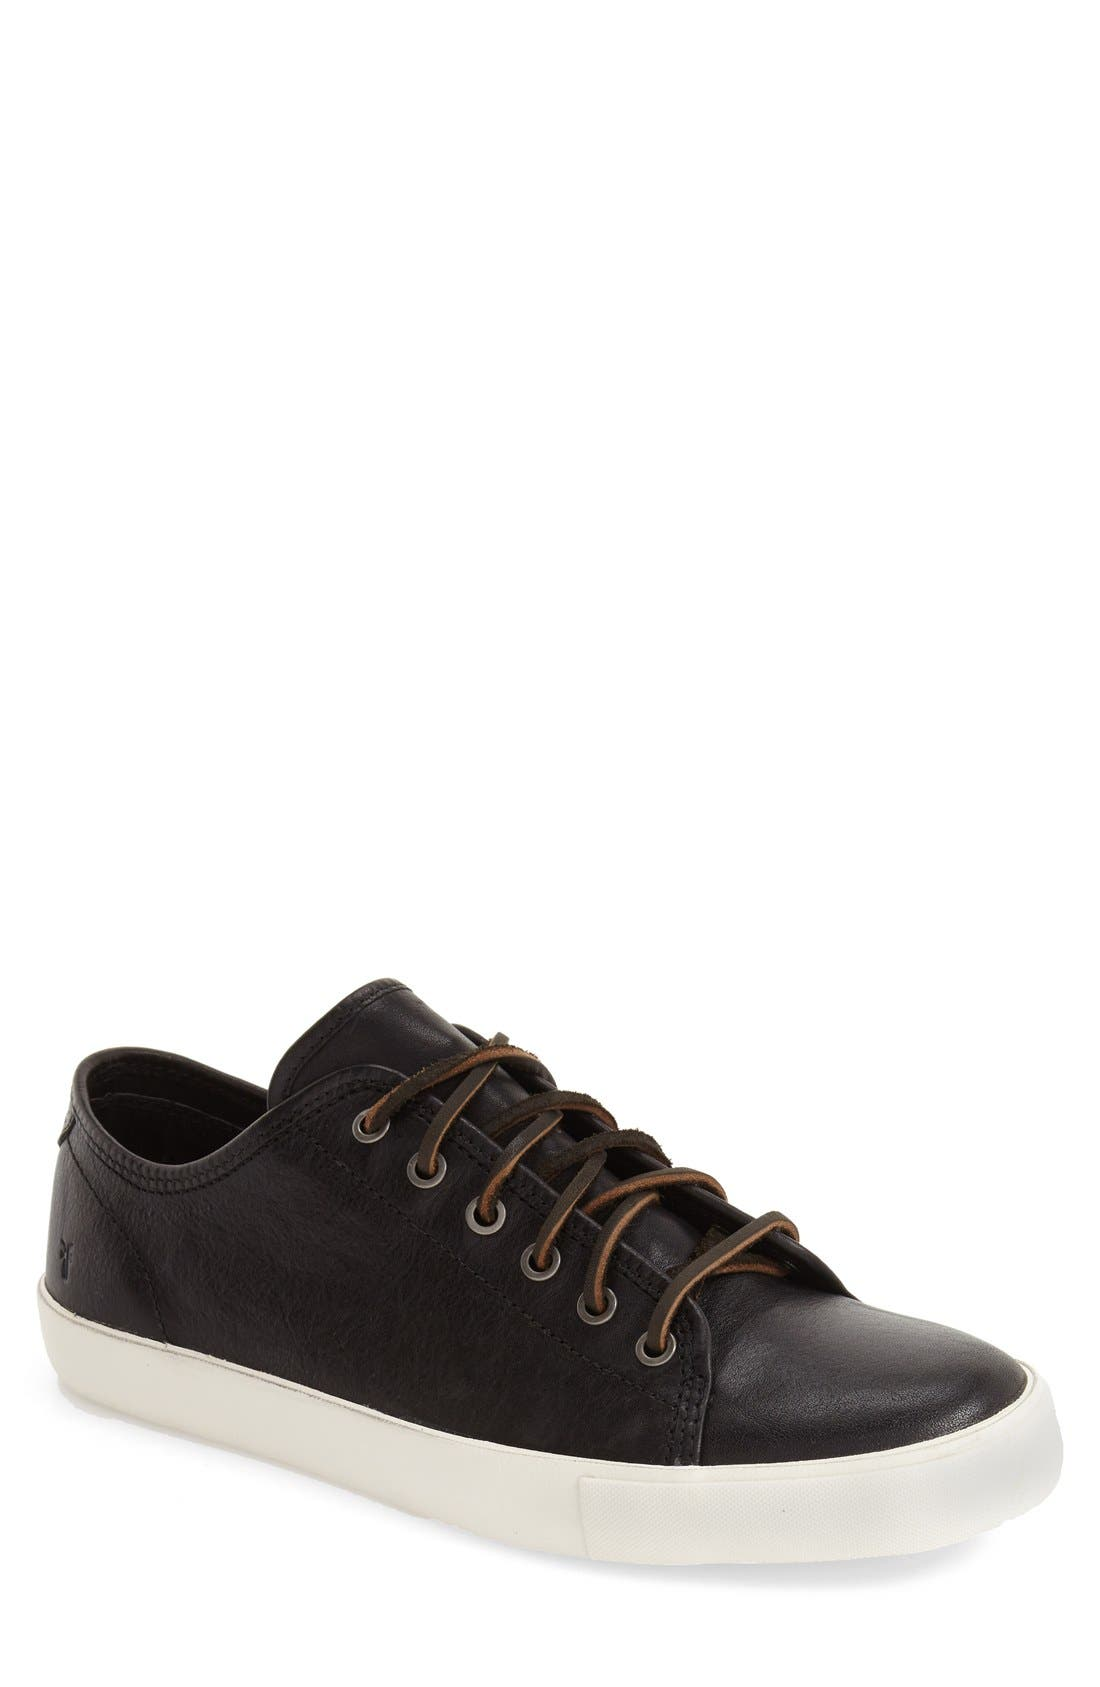 FRYE 'Brett' Sneaker, Main, color, 001